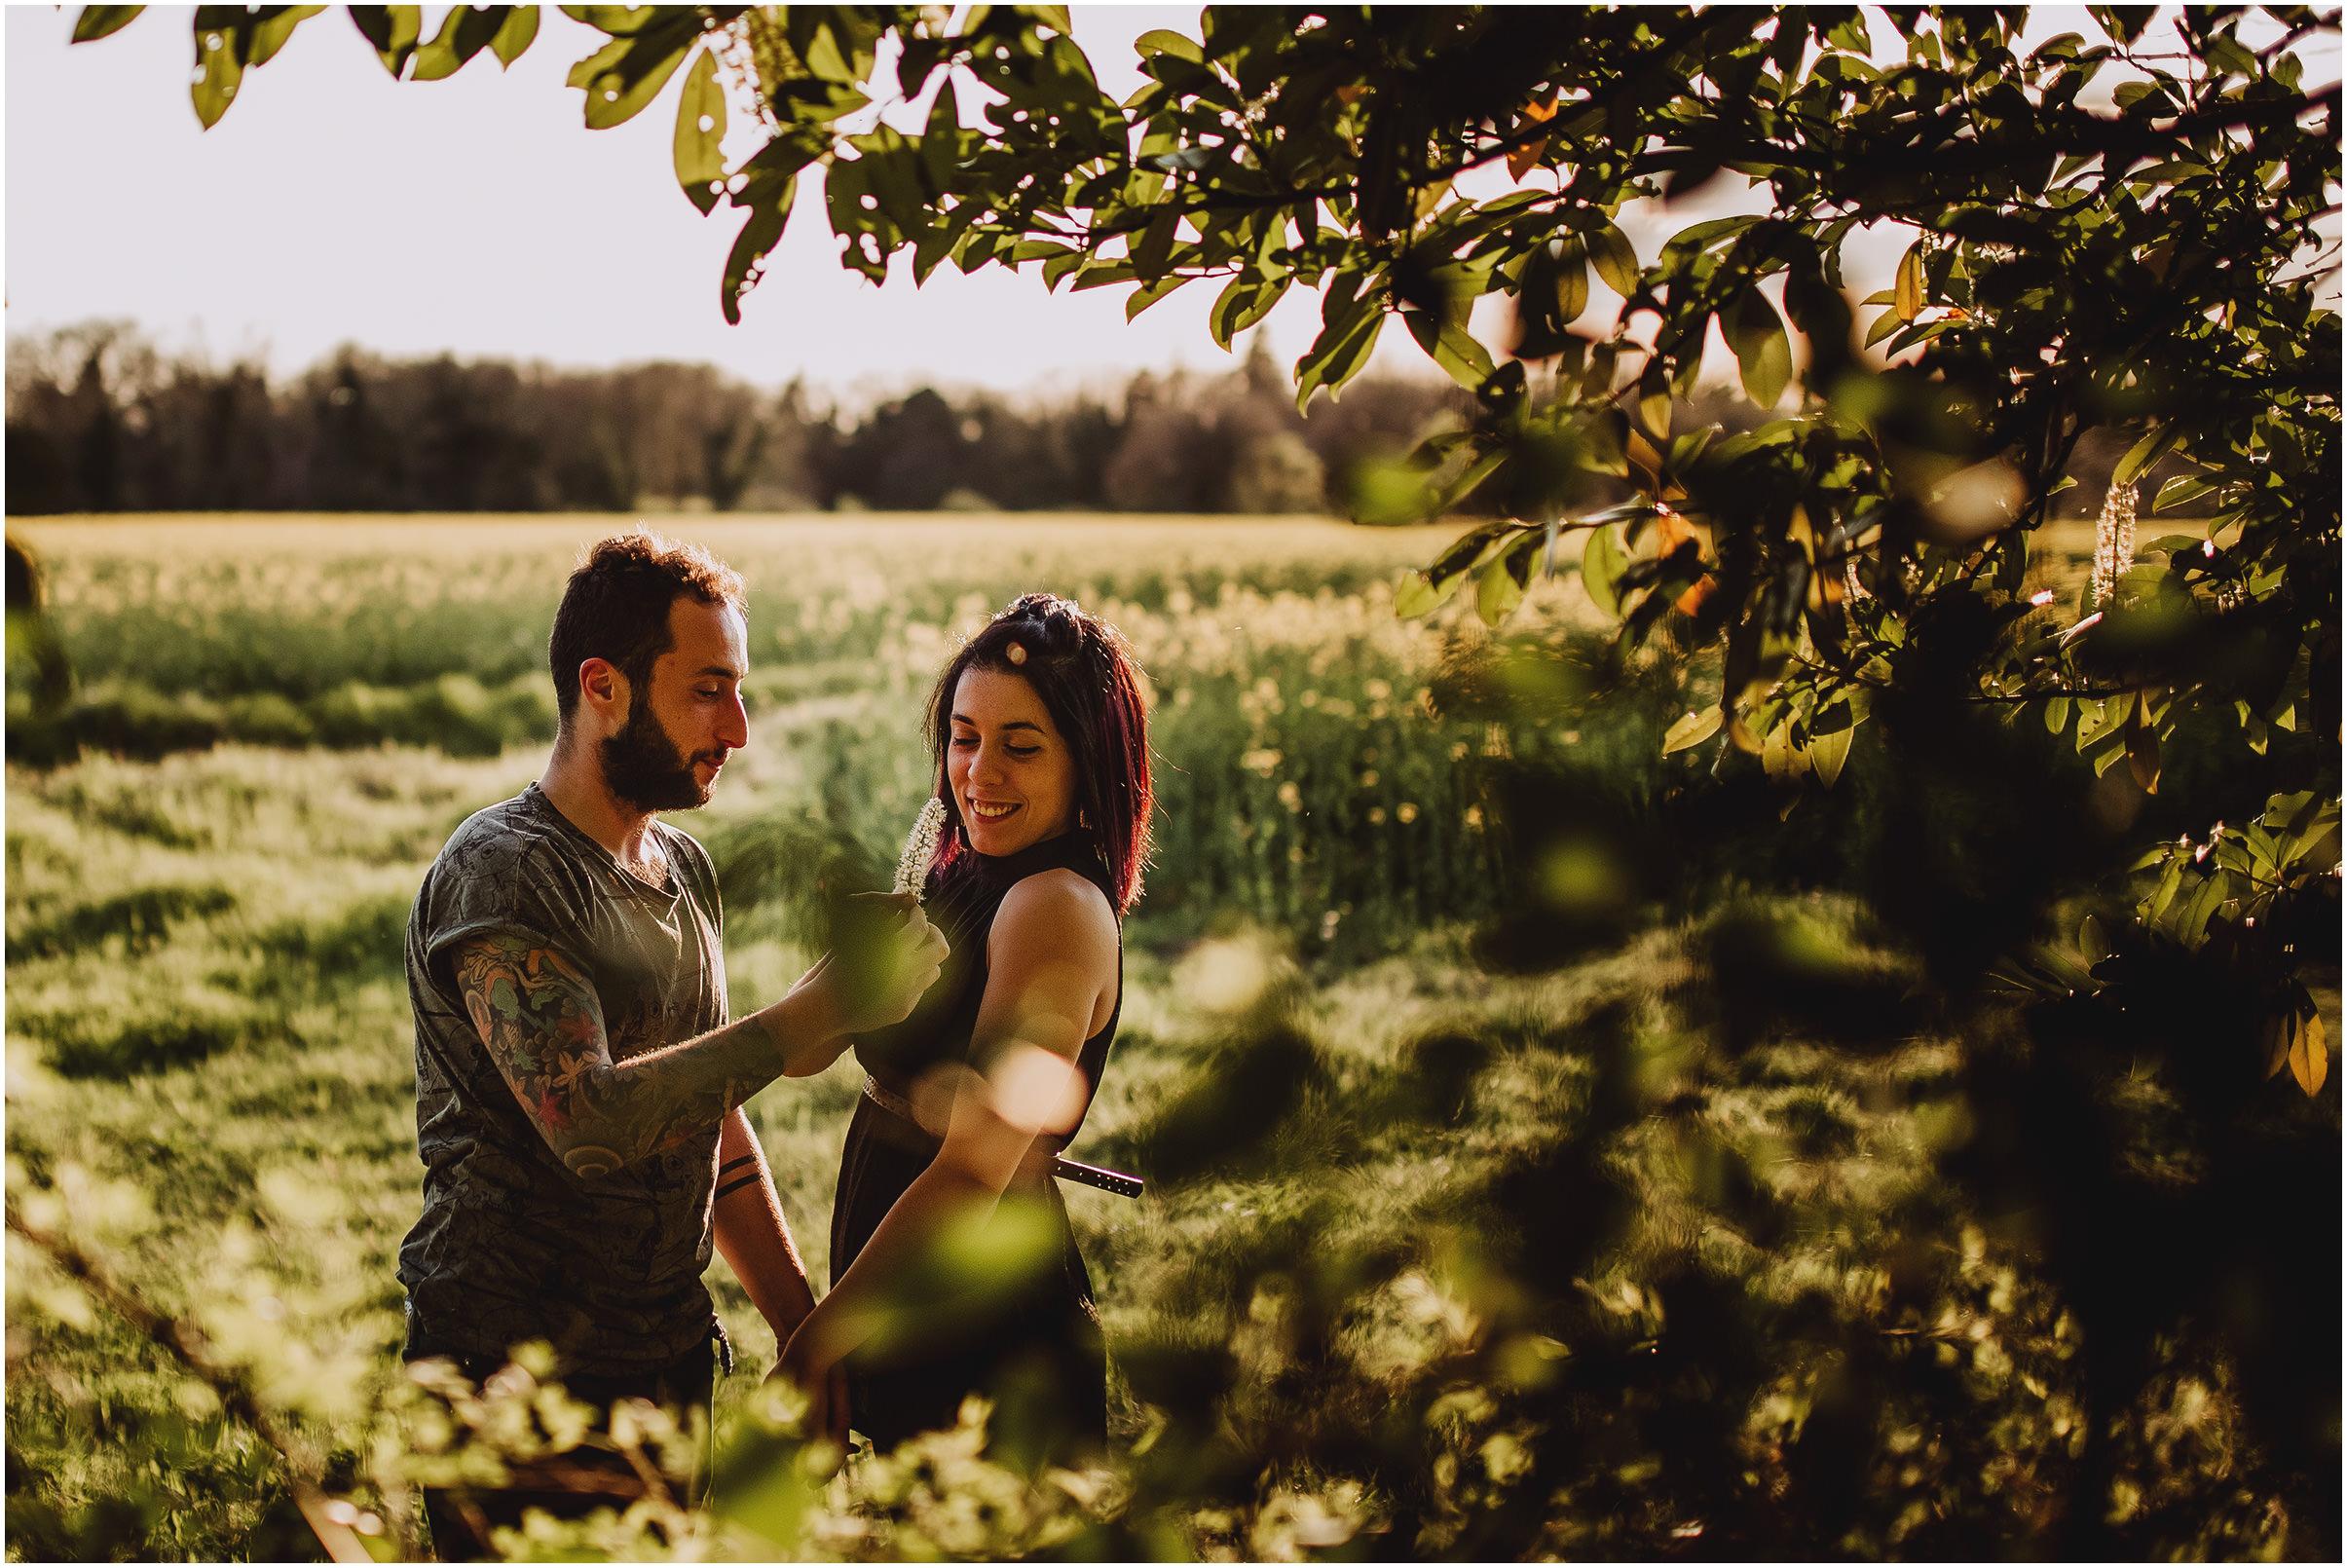 coppia-lovesession-marta-nicola-sara-lorenzoni-fotografia-wedding-matrimonio-arezzo-06